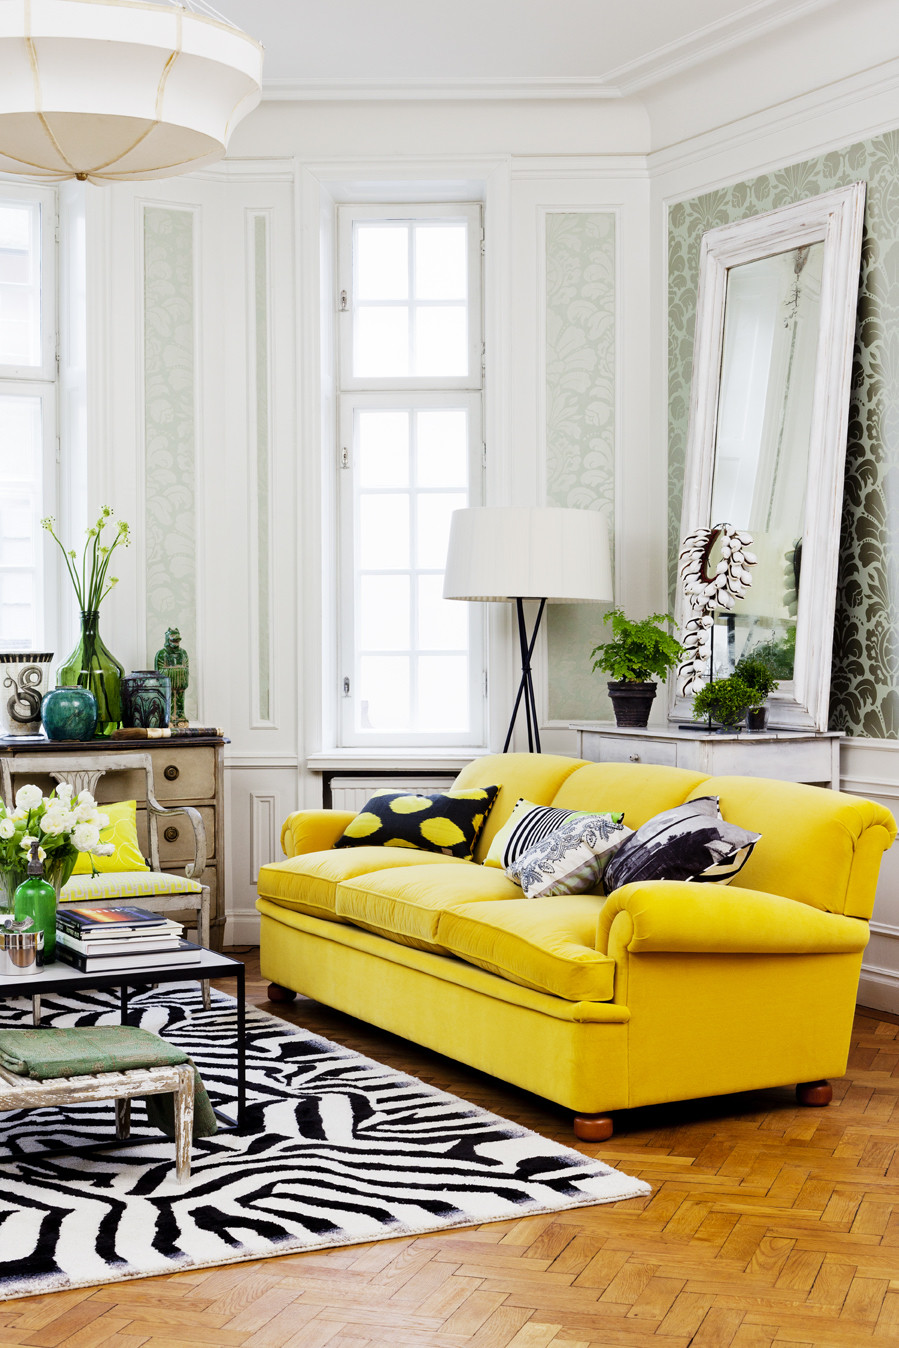 crowded yellow sofa